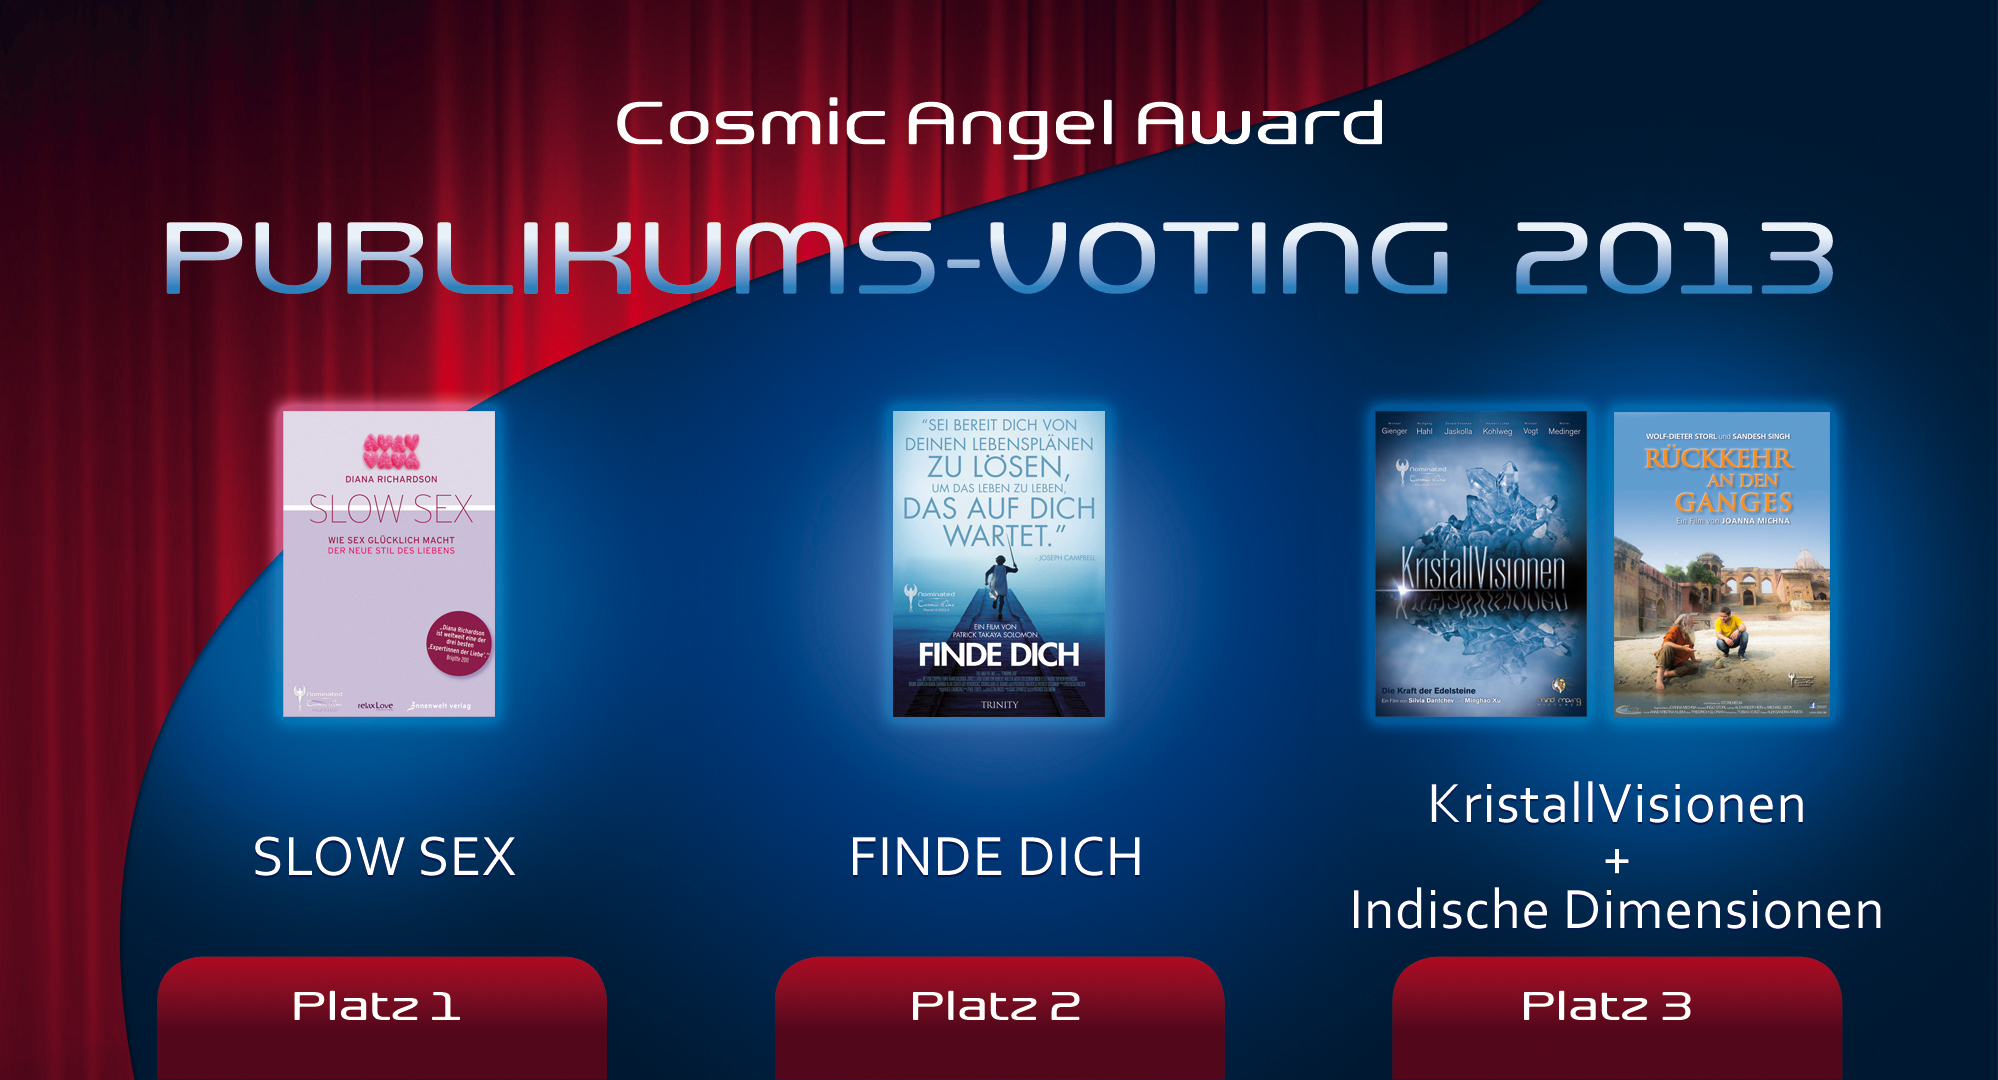 01 Cosmic Cine Filmfestival 2013 - Cosmic Angel Award 2013 PUBLIKUM